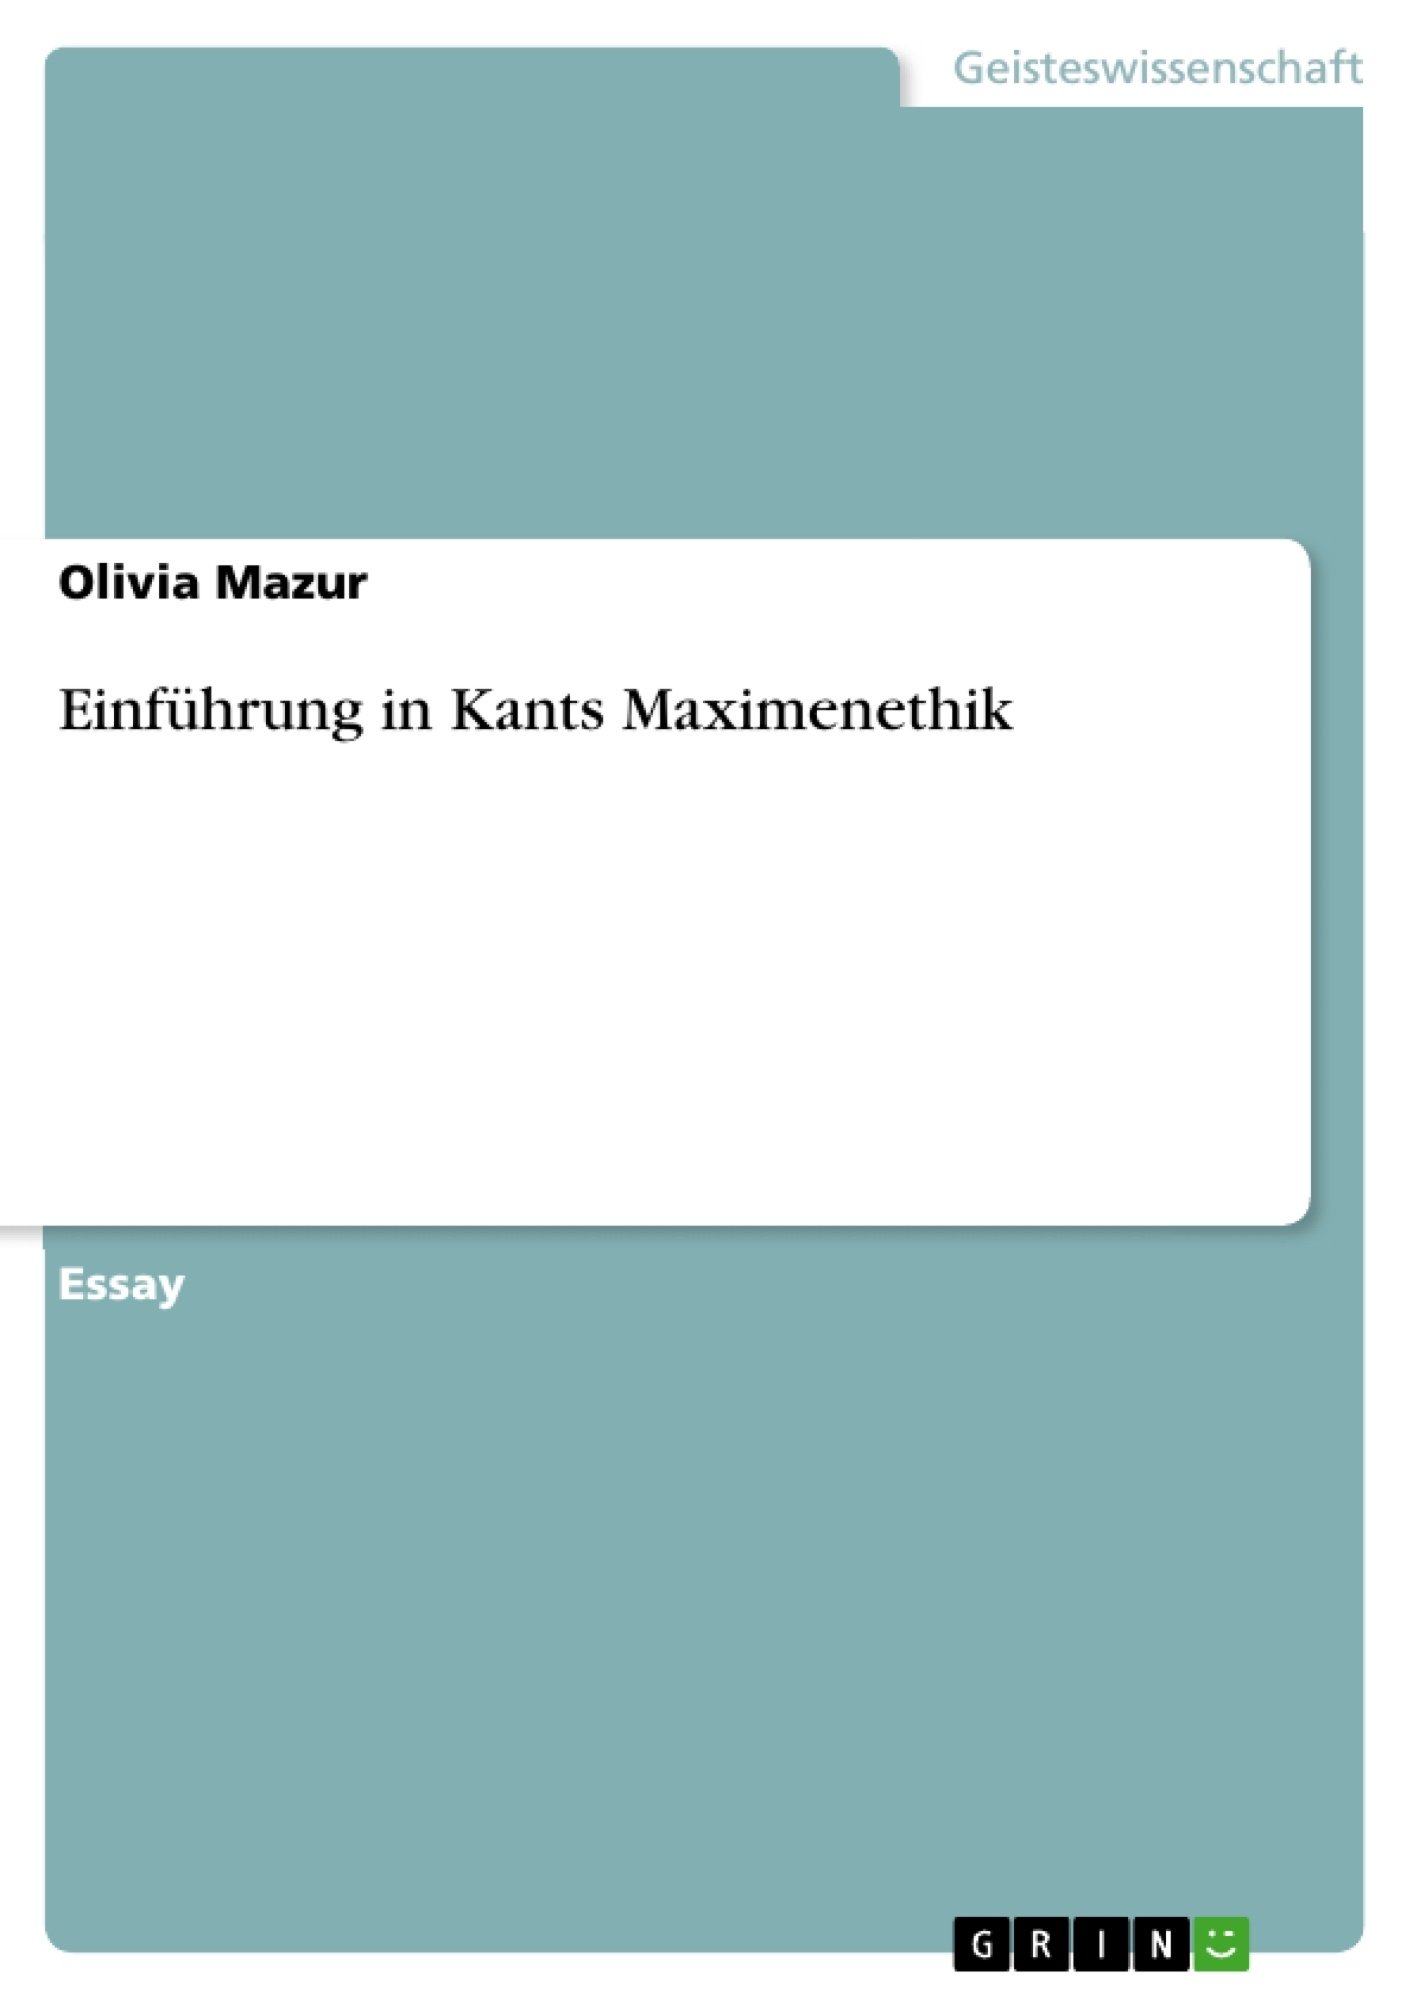 Titel: Einführung in Kants Maximenethik